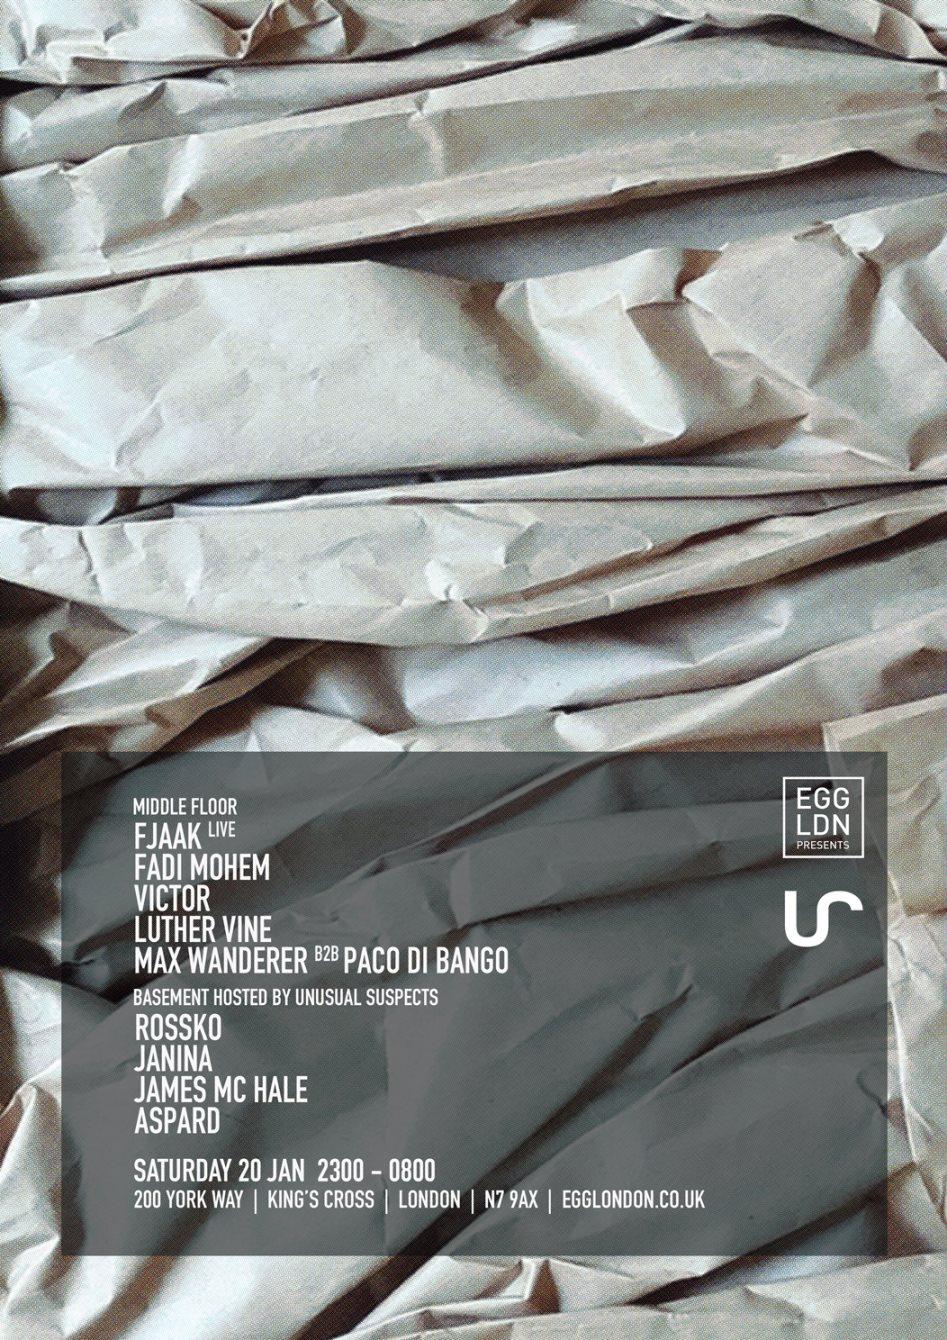 EGG LDN presents: FJAAK (Live), Fadi Mohem, Victor, Unusual Suspects, Rossko - Flyer front